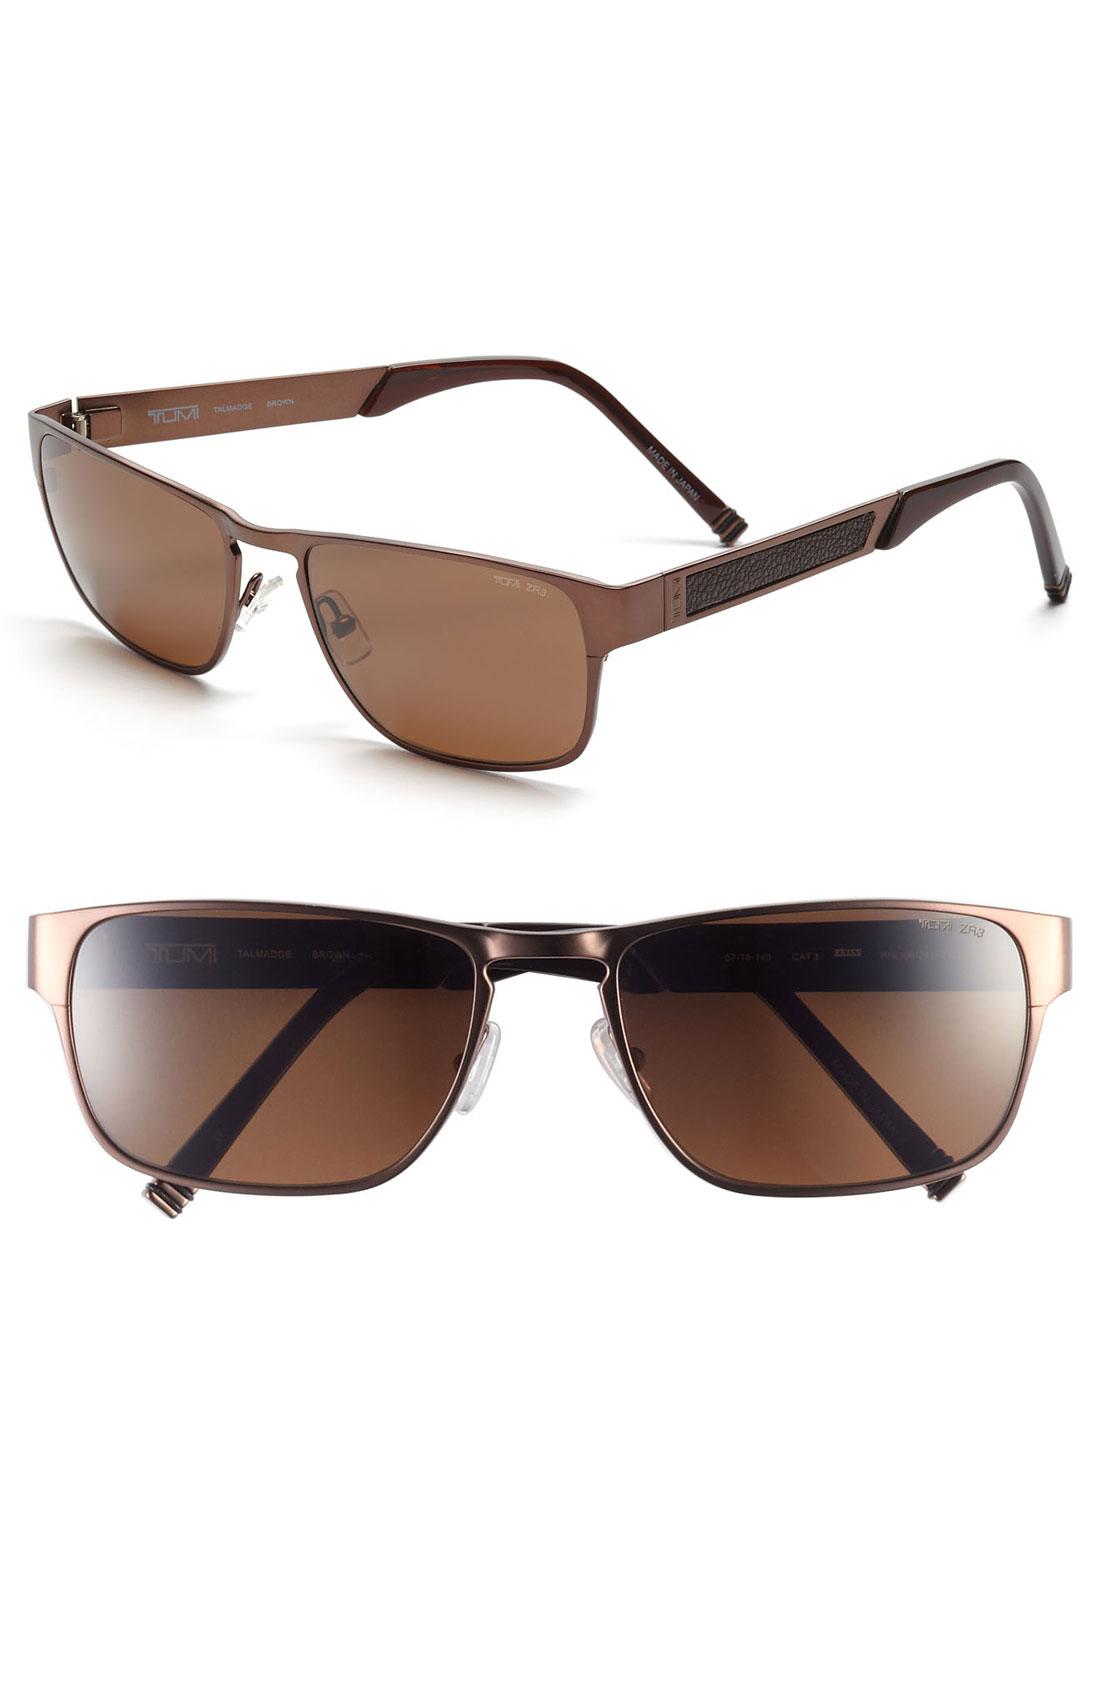 Glasses Frame Repair Newport : Tumi Polarized Sunglasses News Celebrity